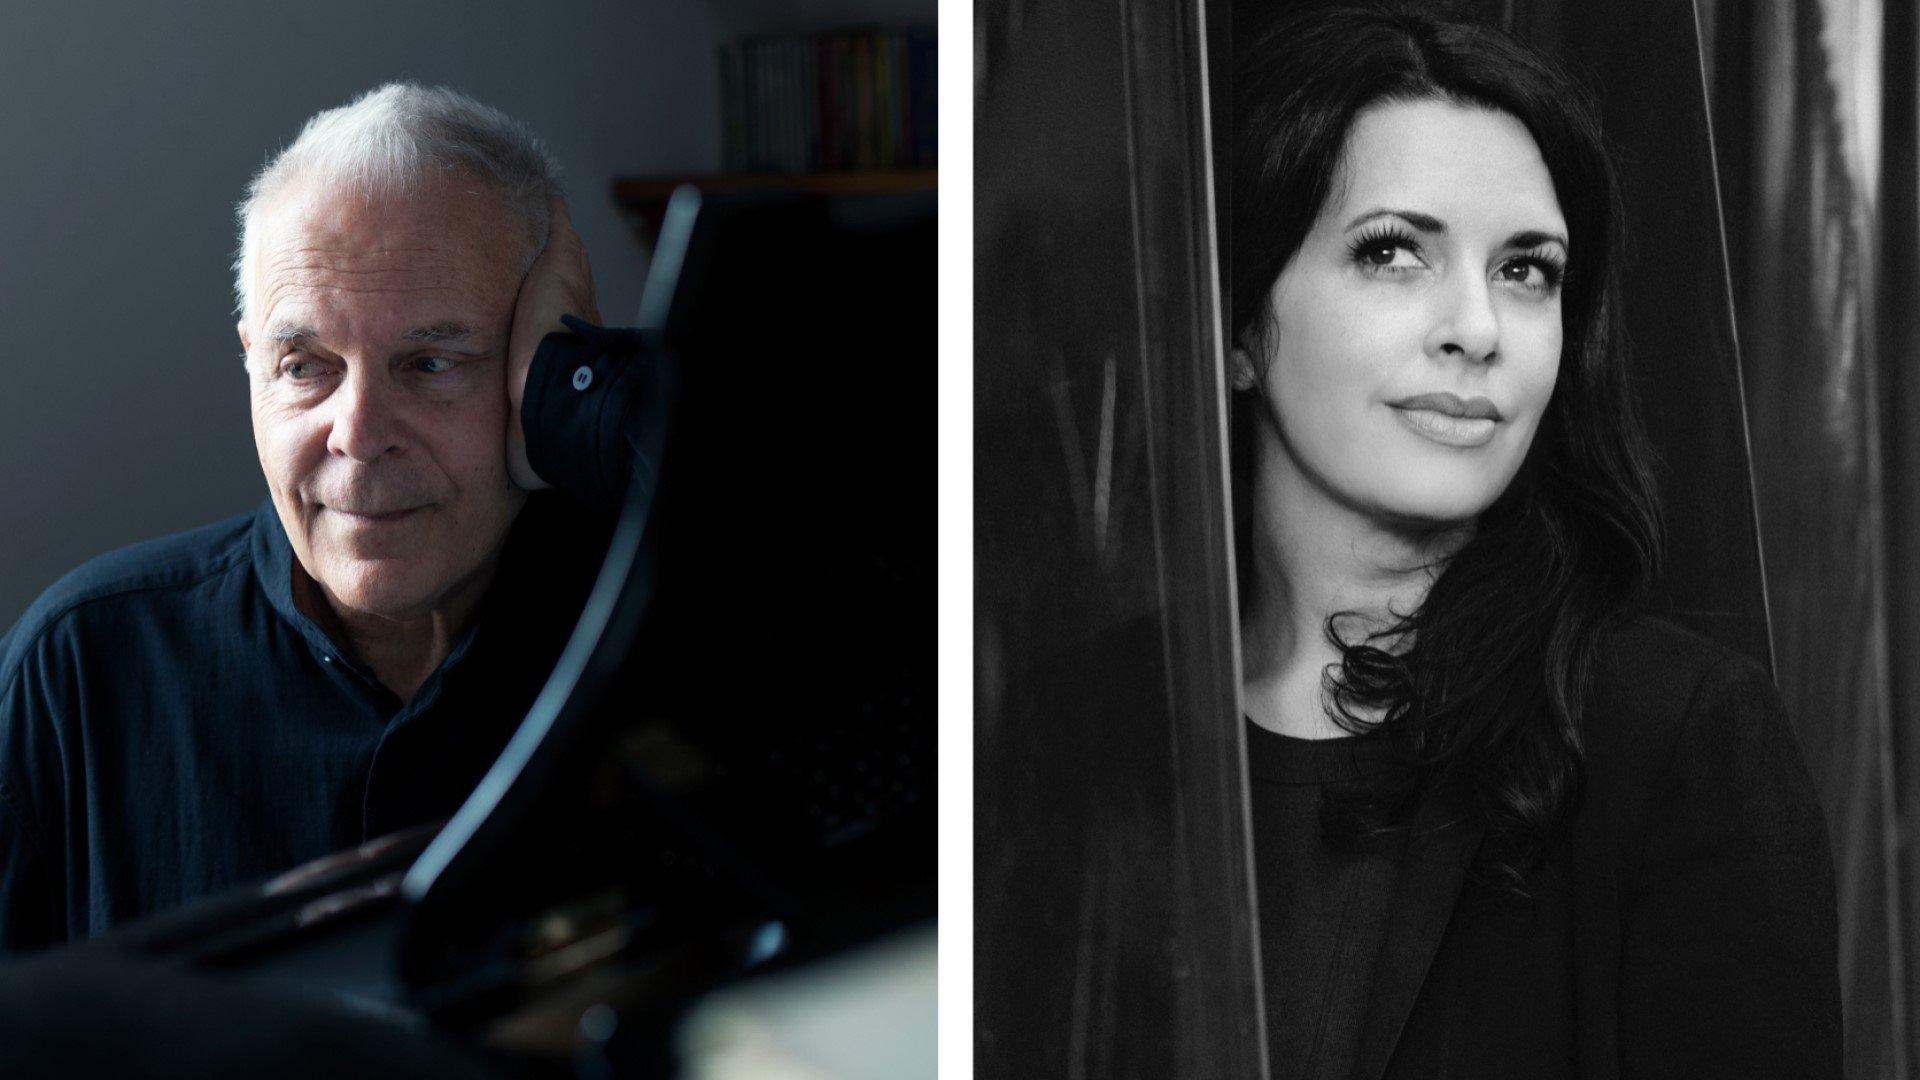 'Life Returns – A Transcendence of Pain' Stephen Kovacevich & Priya Mitchell